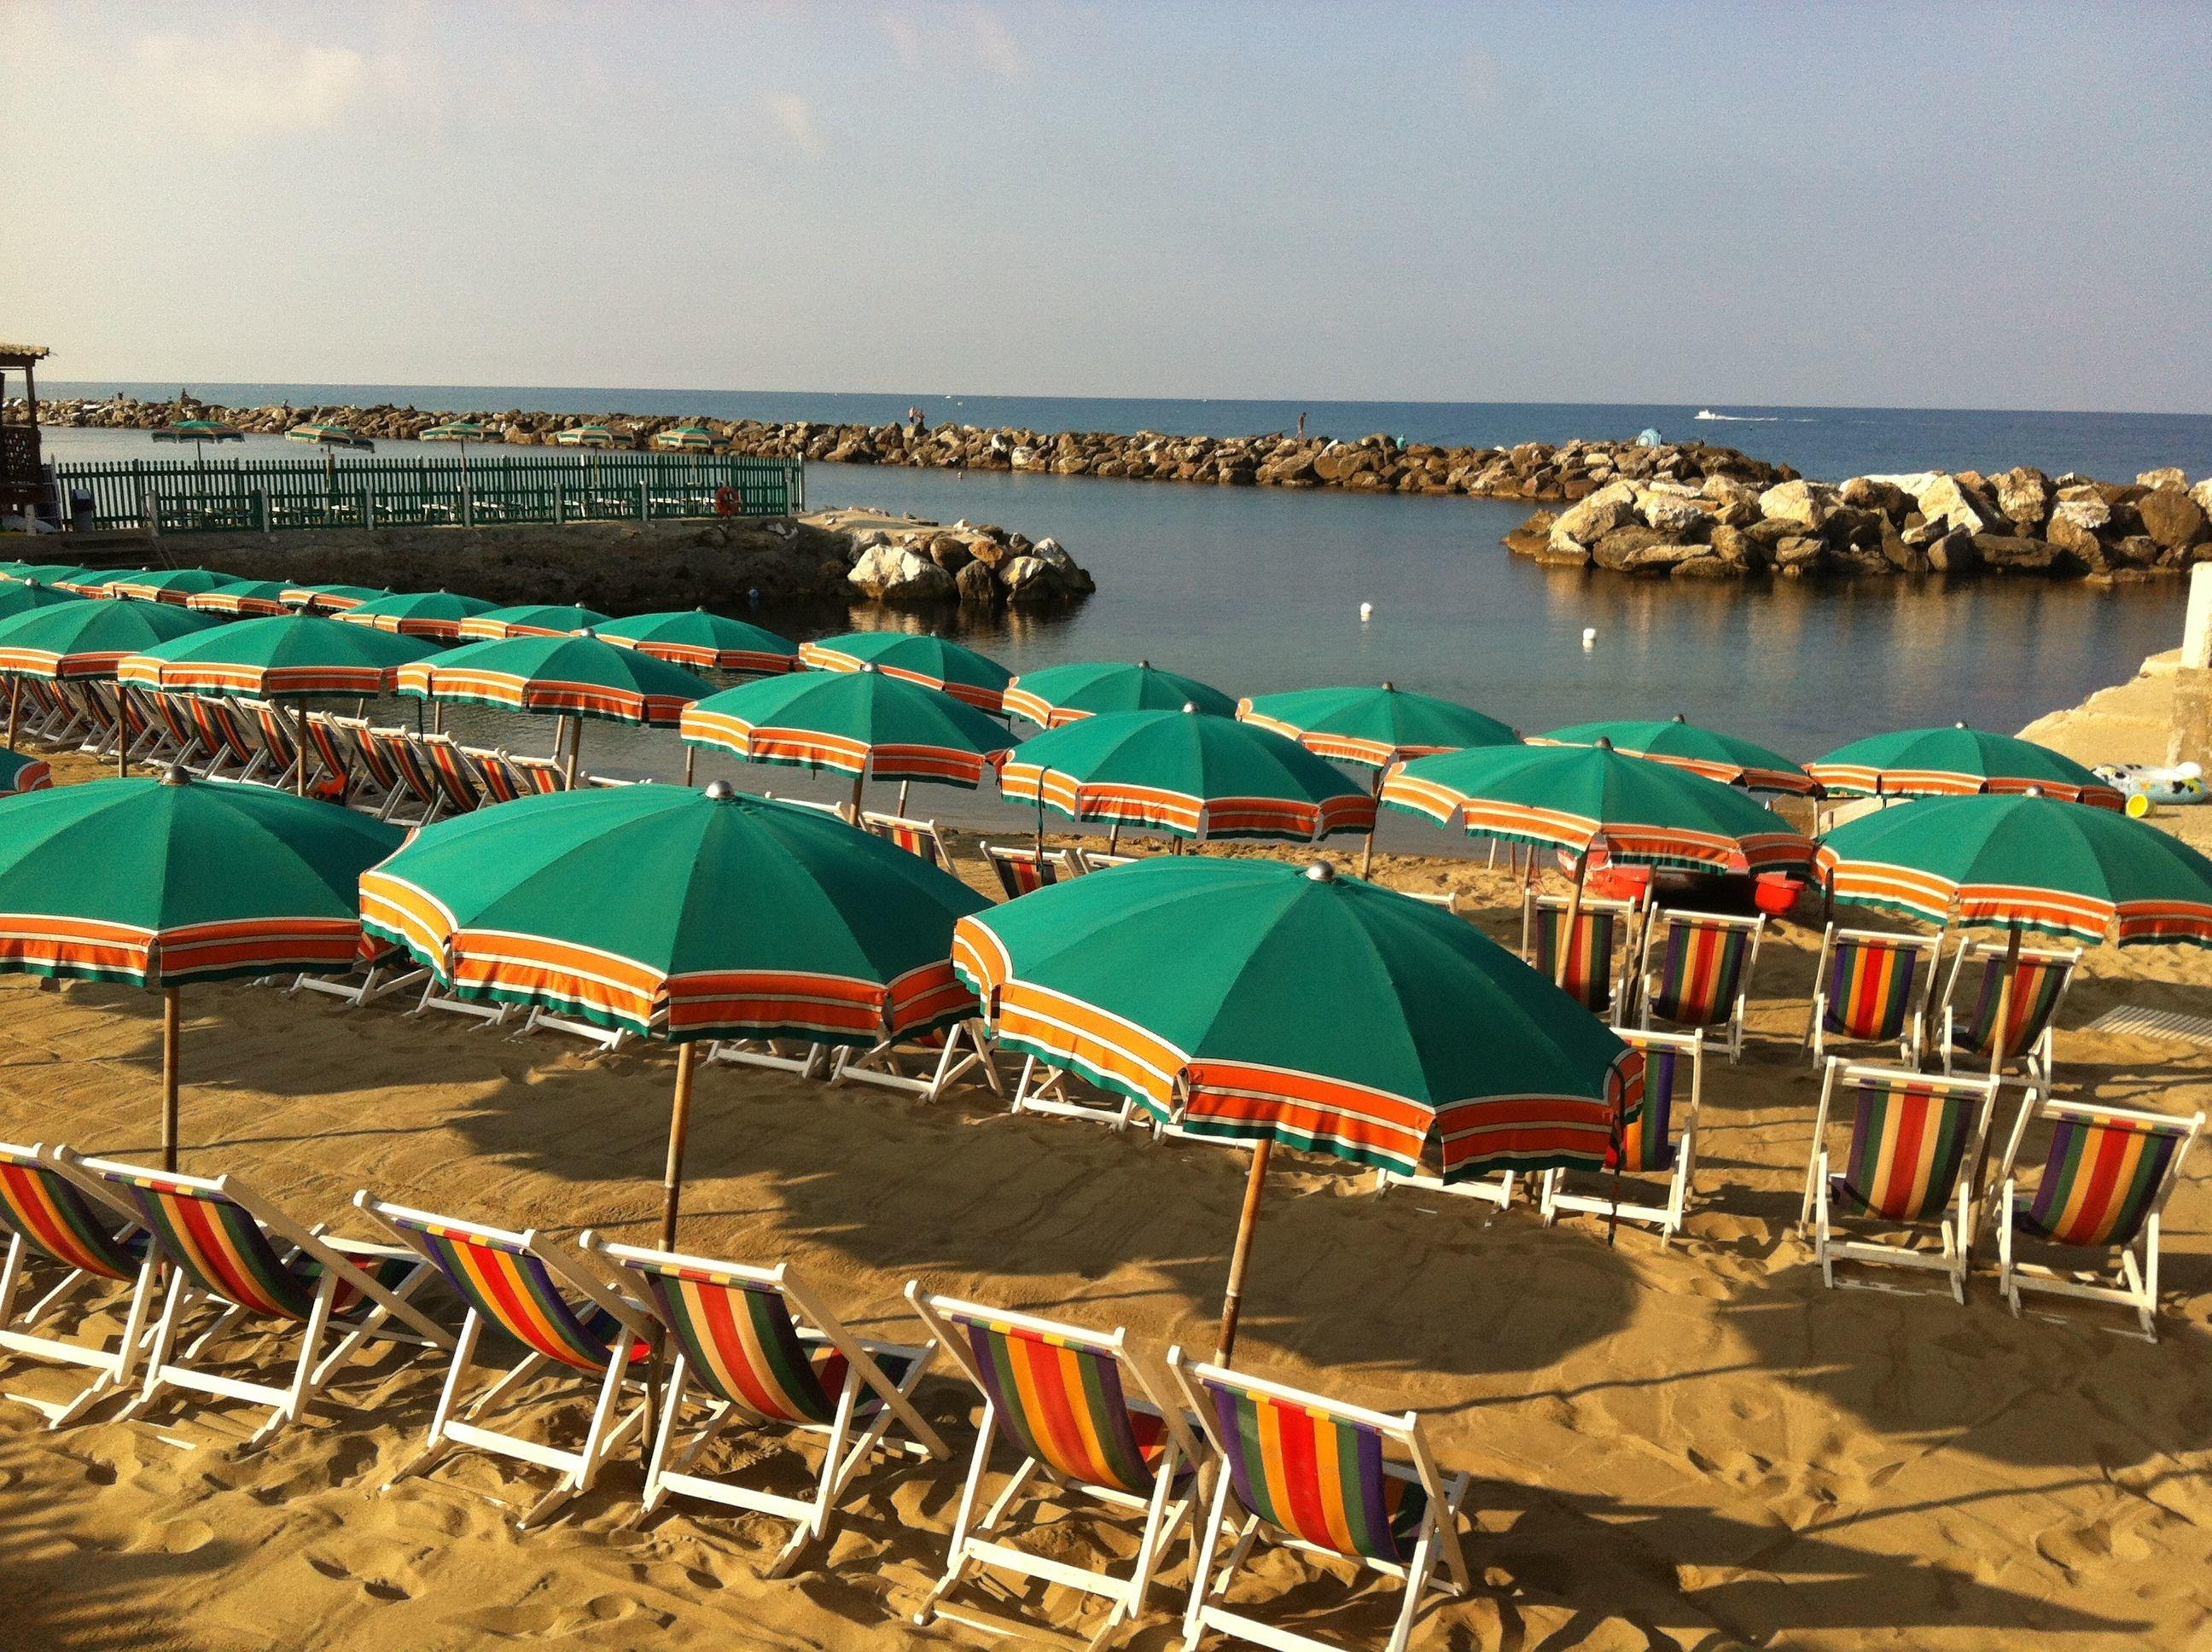 Bagno Balena Marina Di Pisa : Stabilimento balneare pisa bagno gorgona overplace